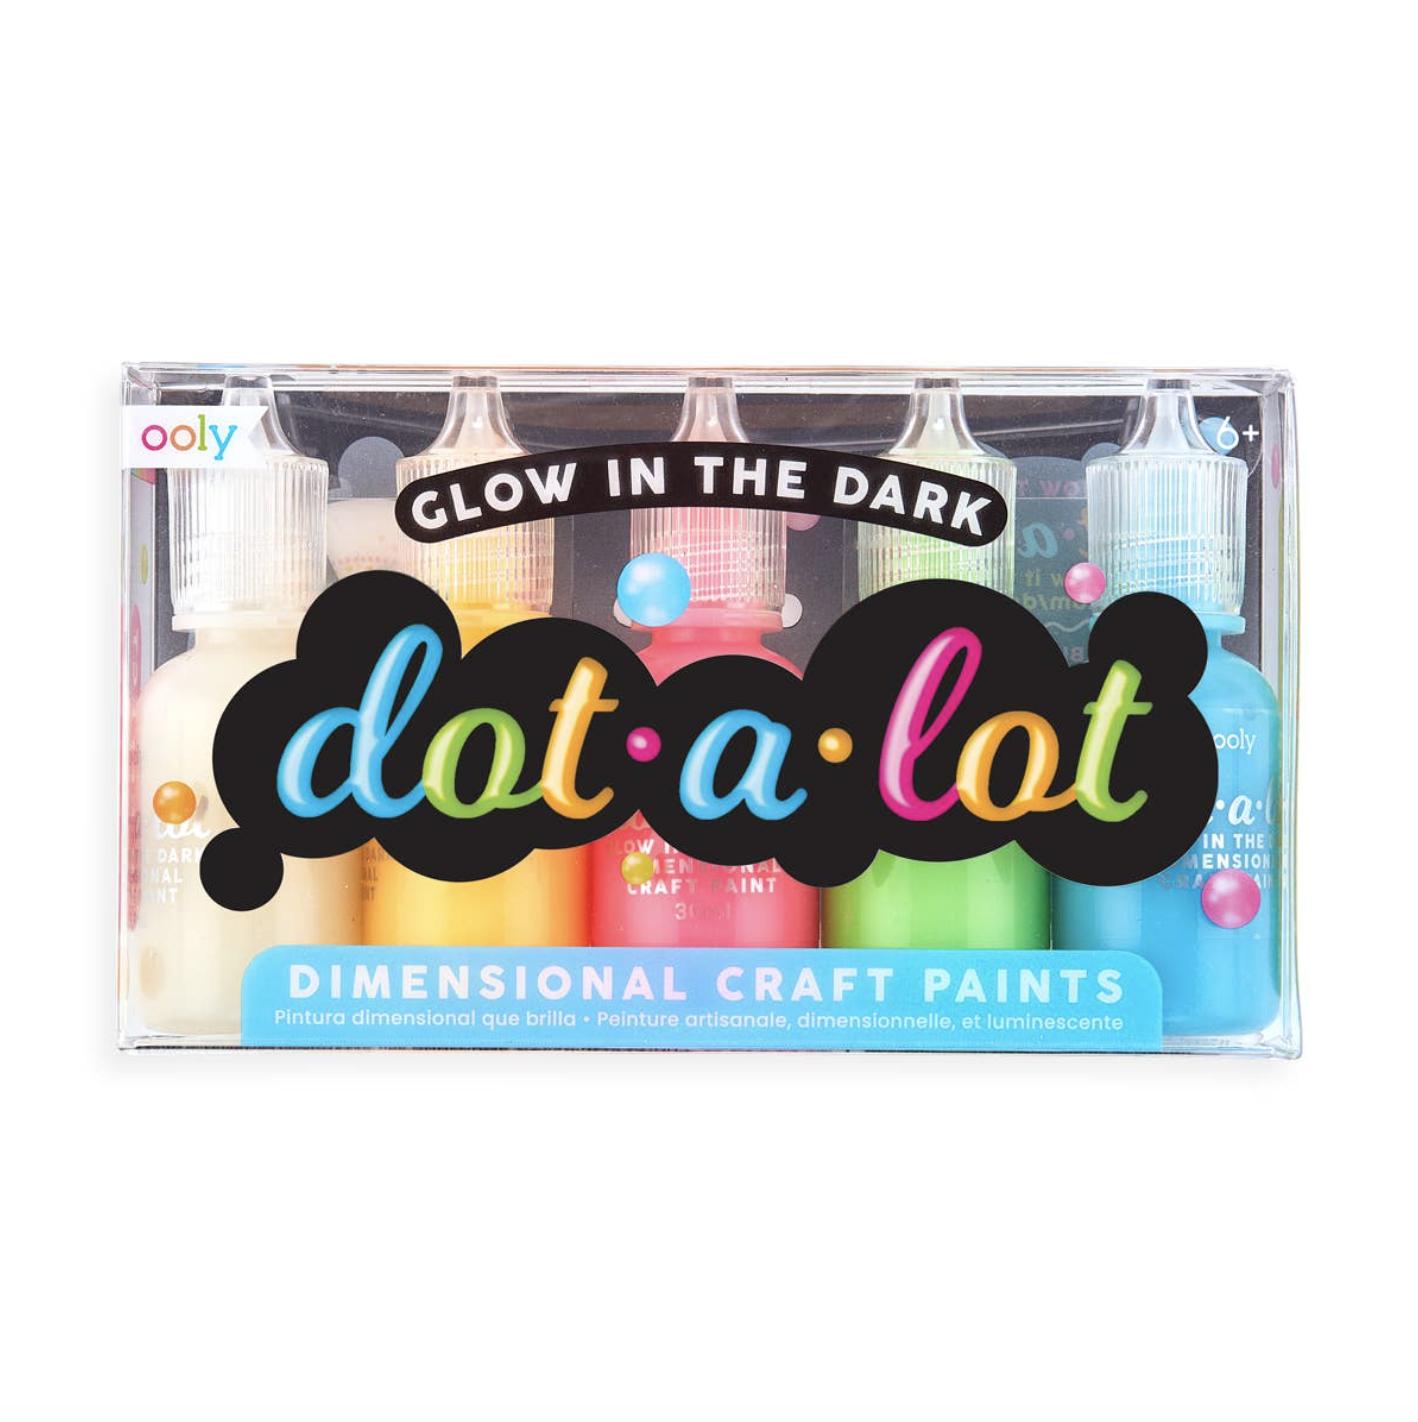 Dot-A-Lot: Glow in the Dark